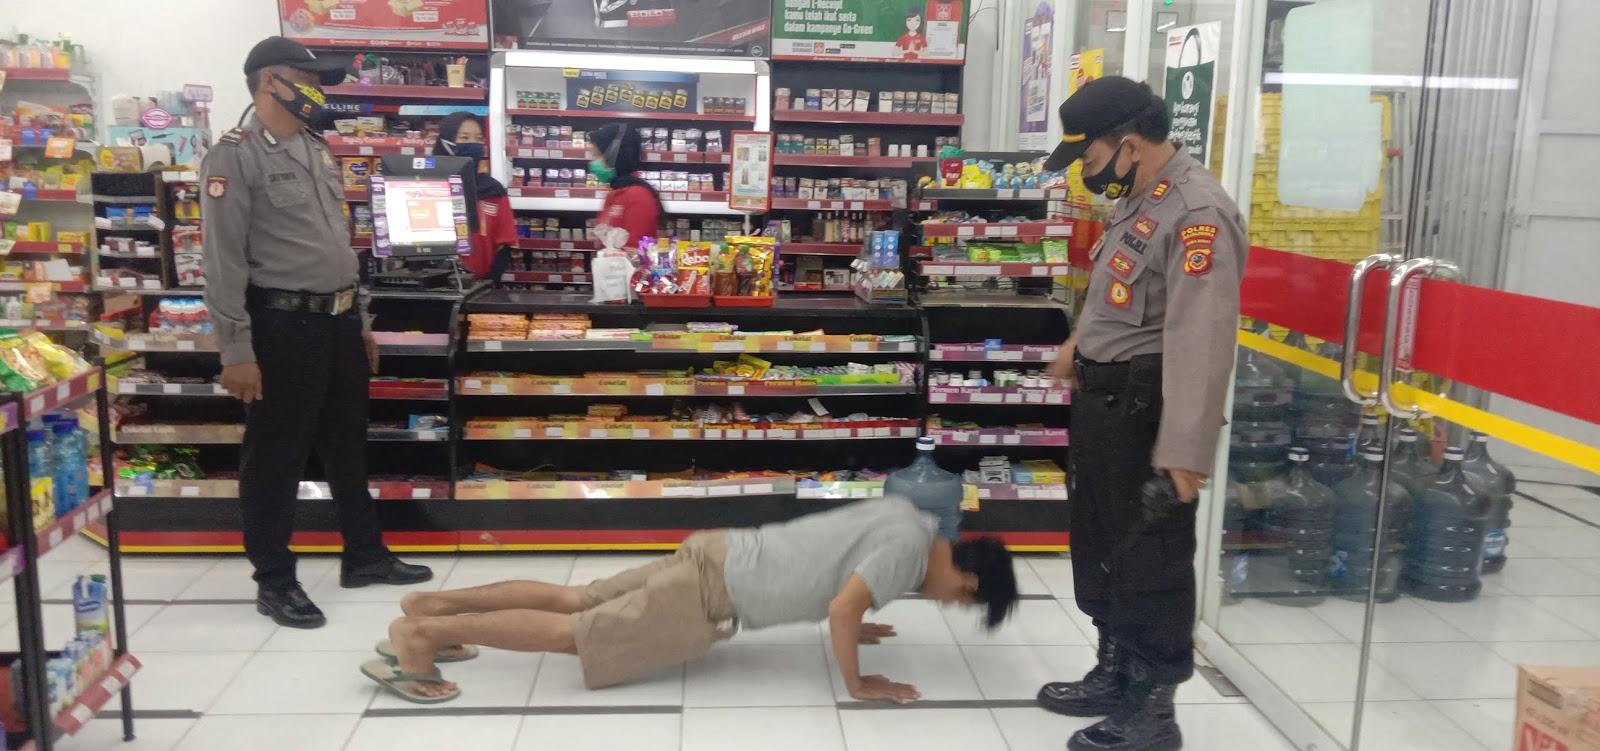 Polsek Dawuan Menggelar Operasi Yustisi di Tempat Perbelanjaan dan Tongkrongan Warga